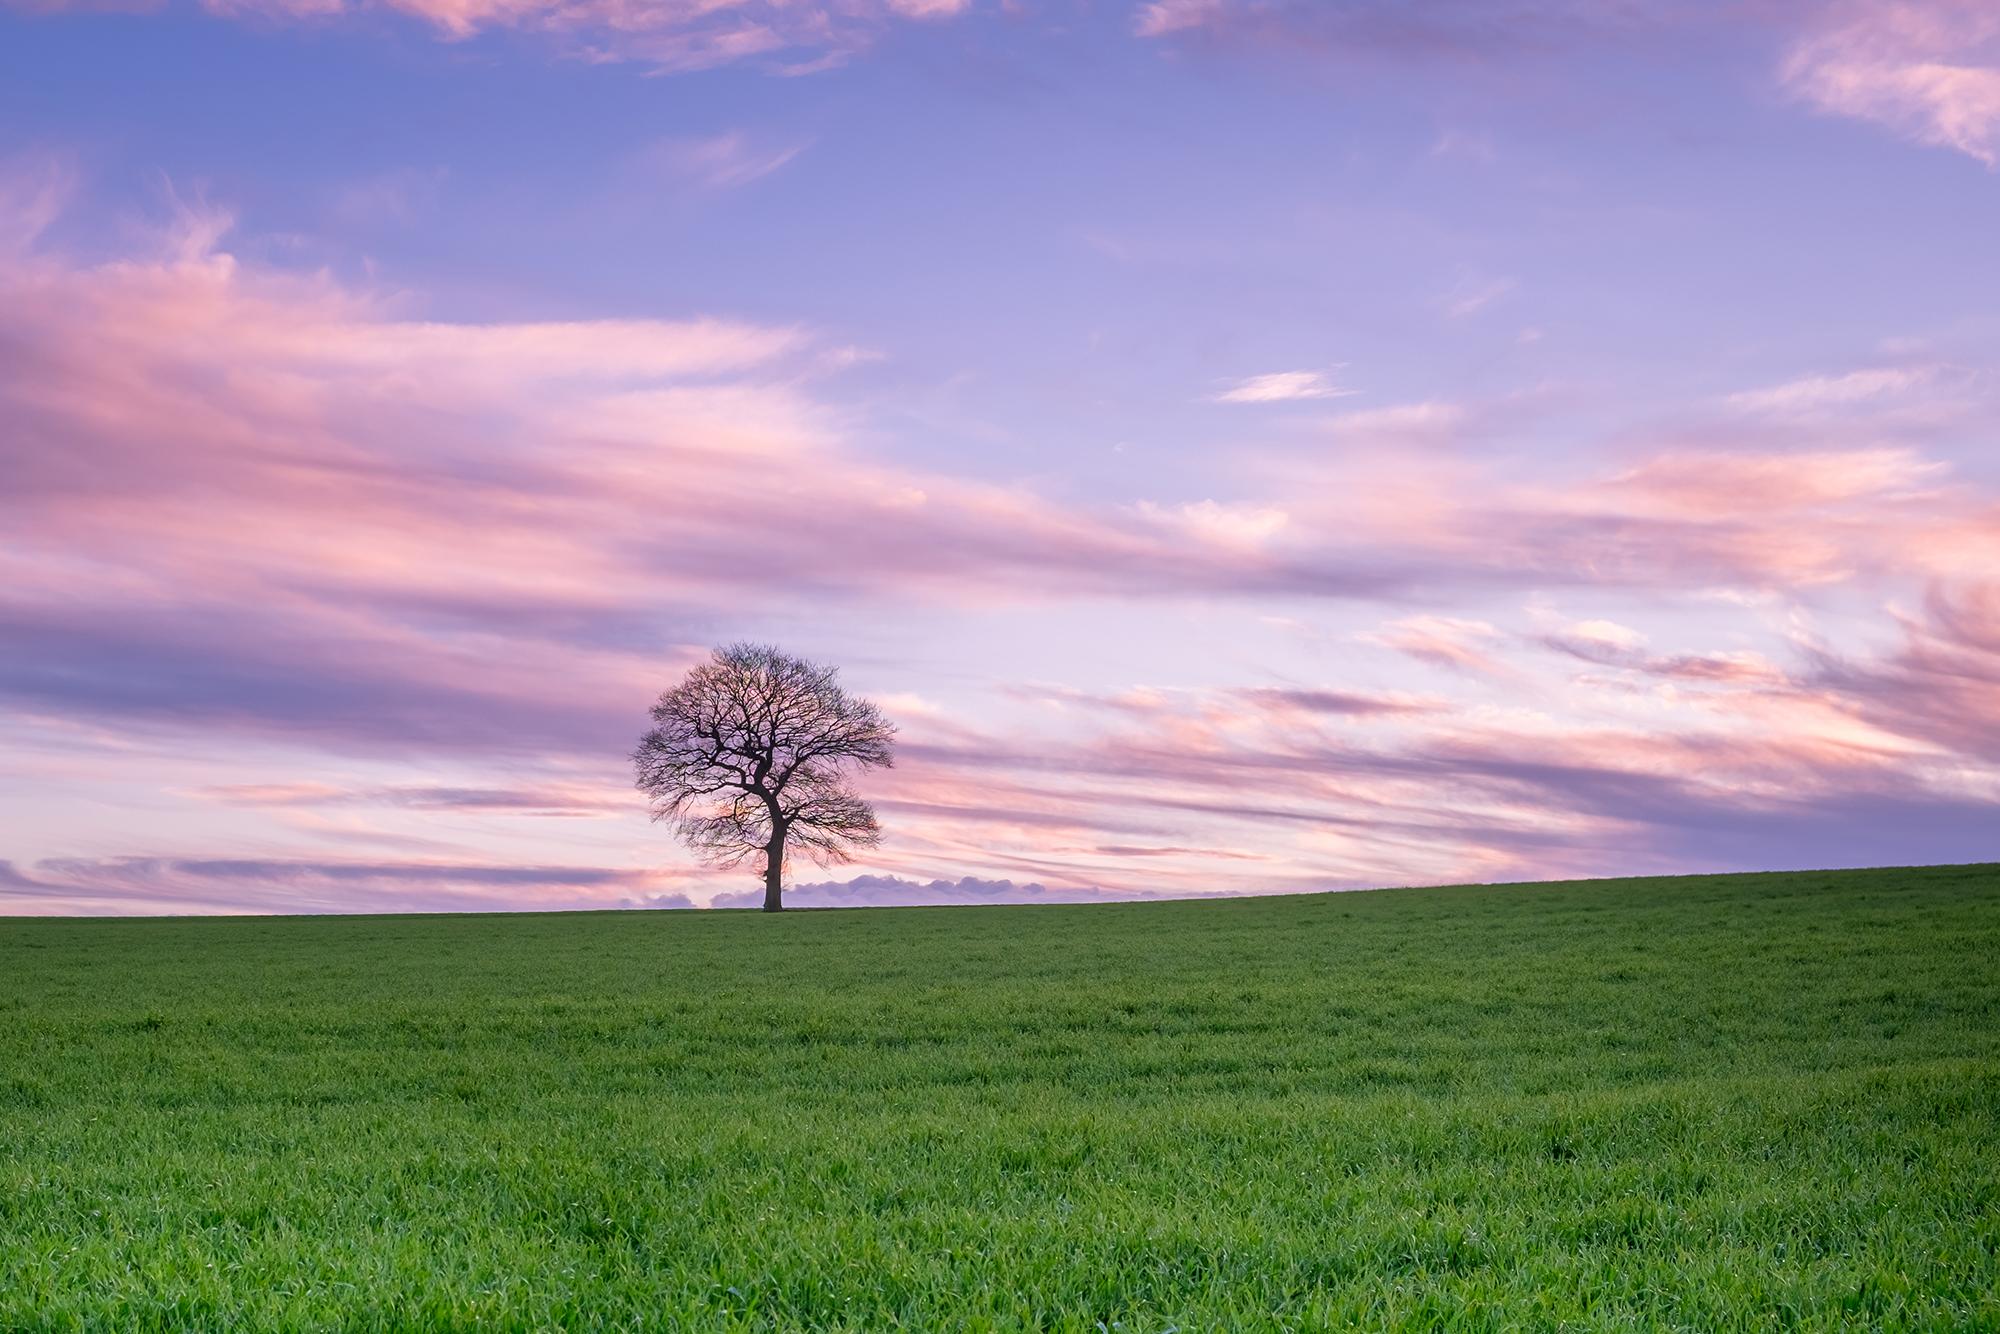 170204 - Surrey - Sunset - Chaldon Field 004.jpg